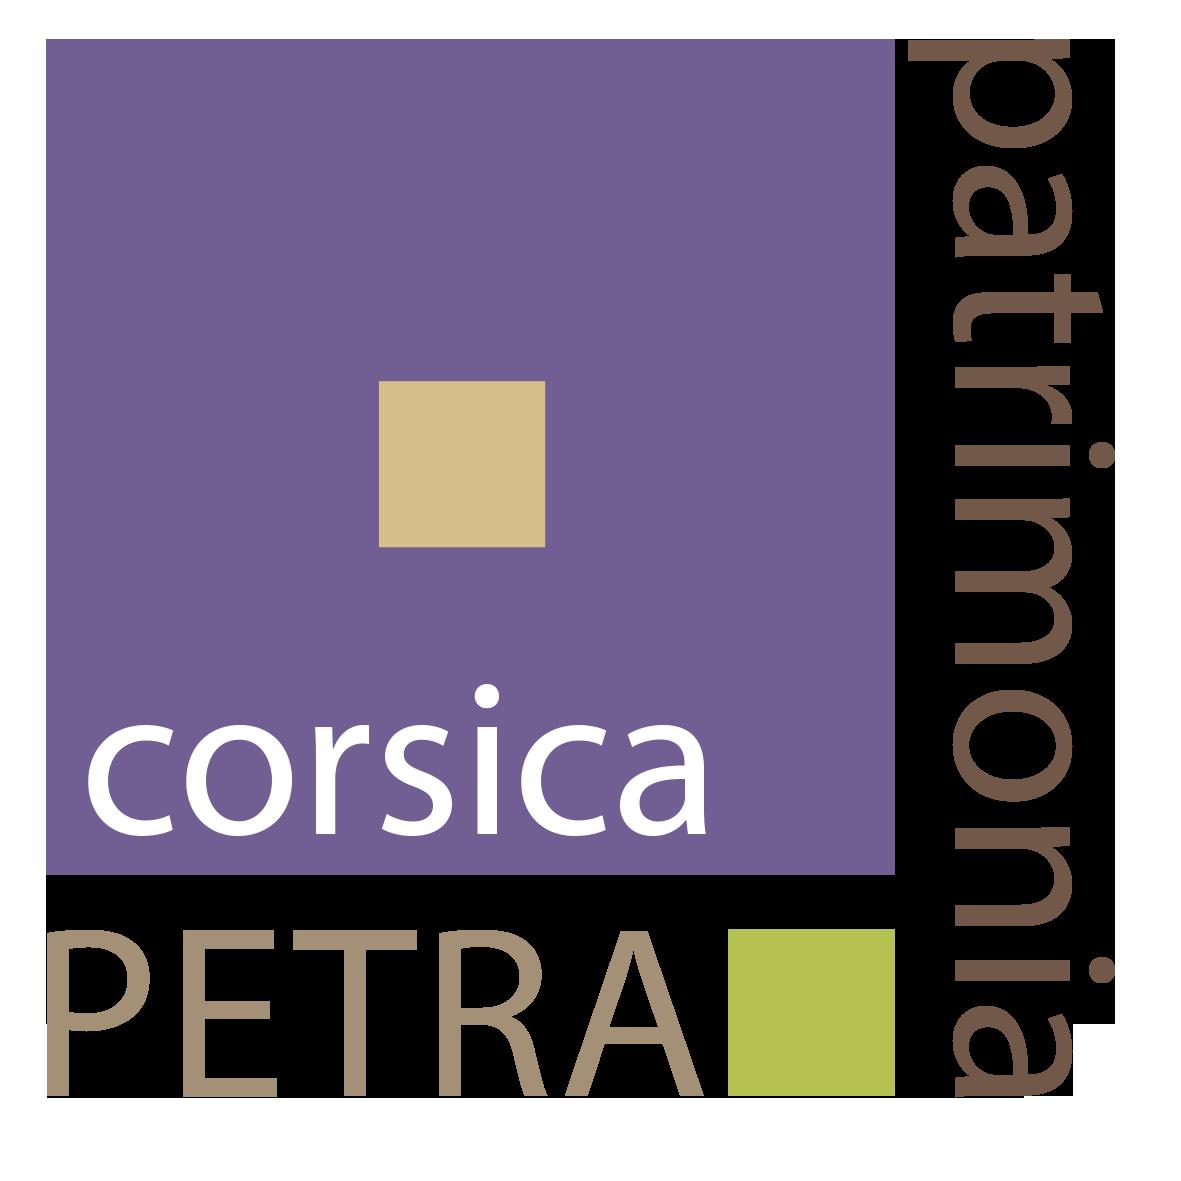 Petra_Corsica